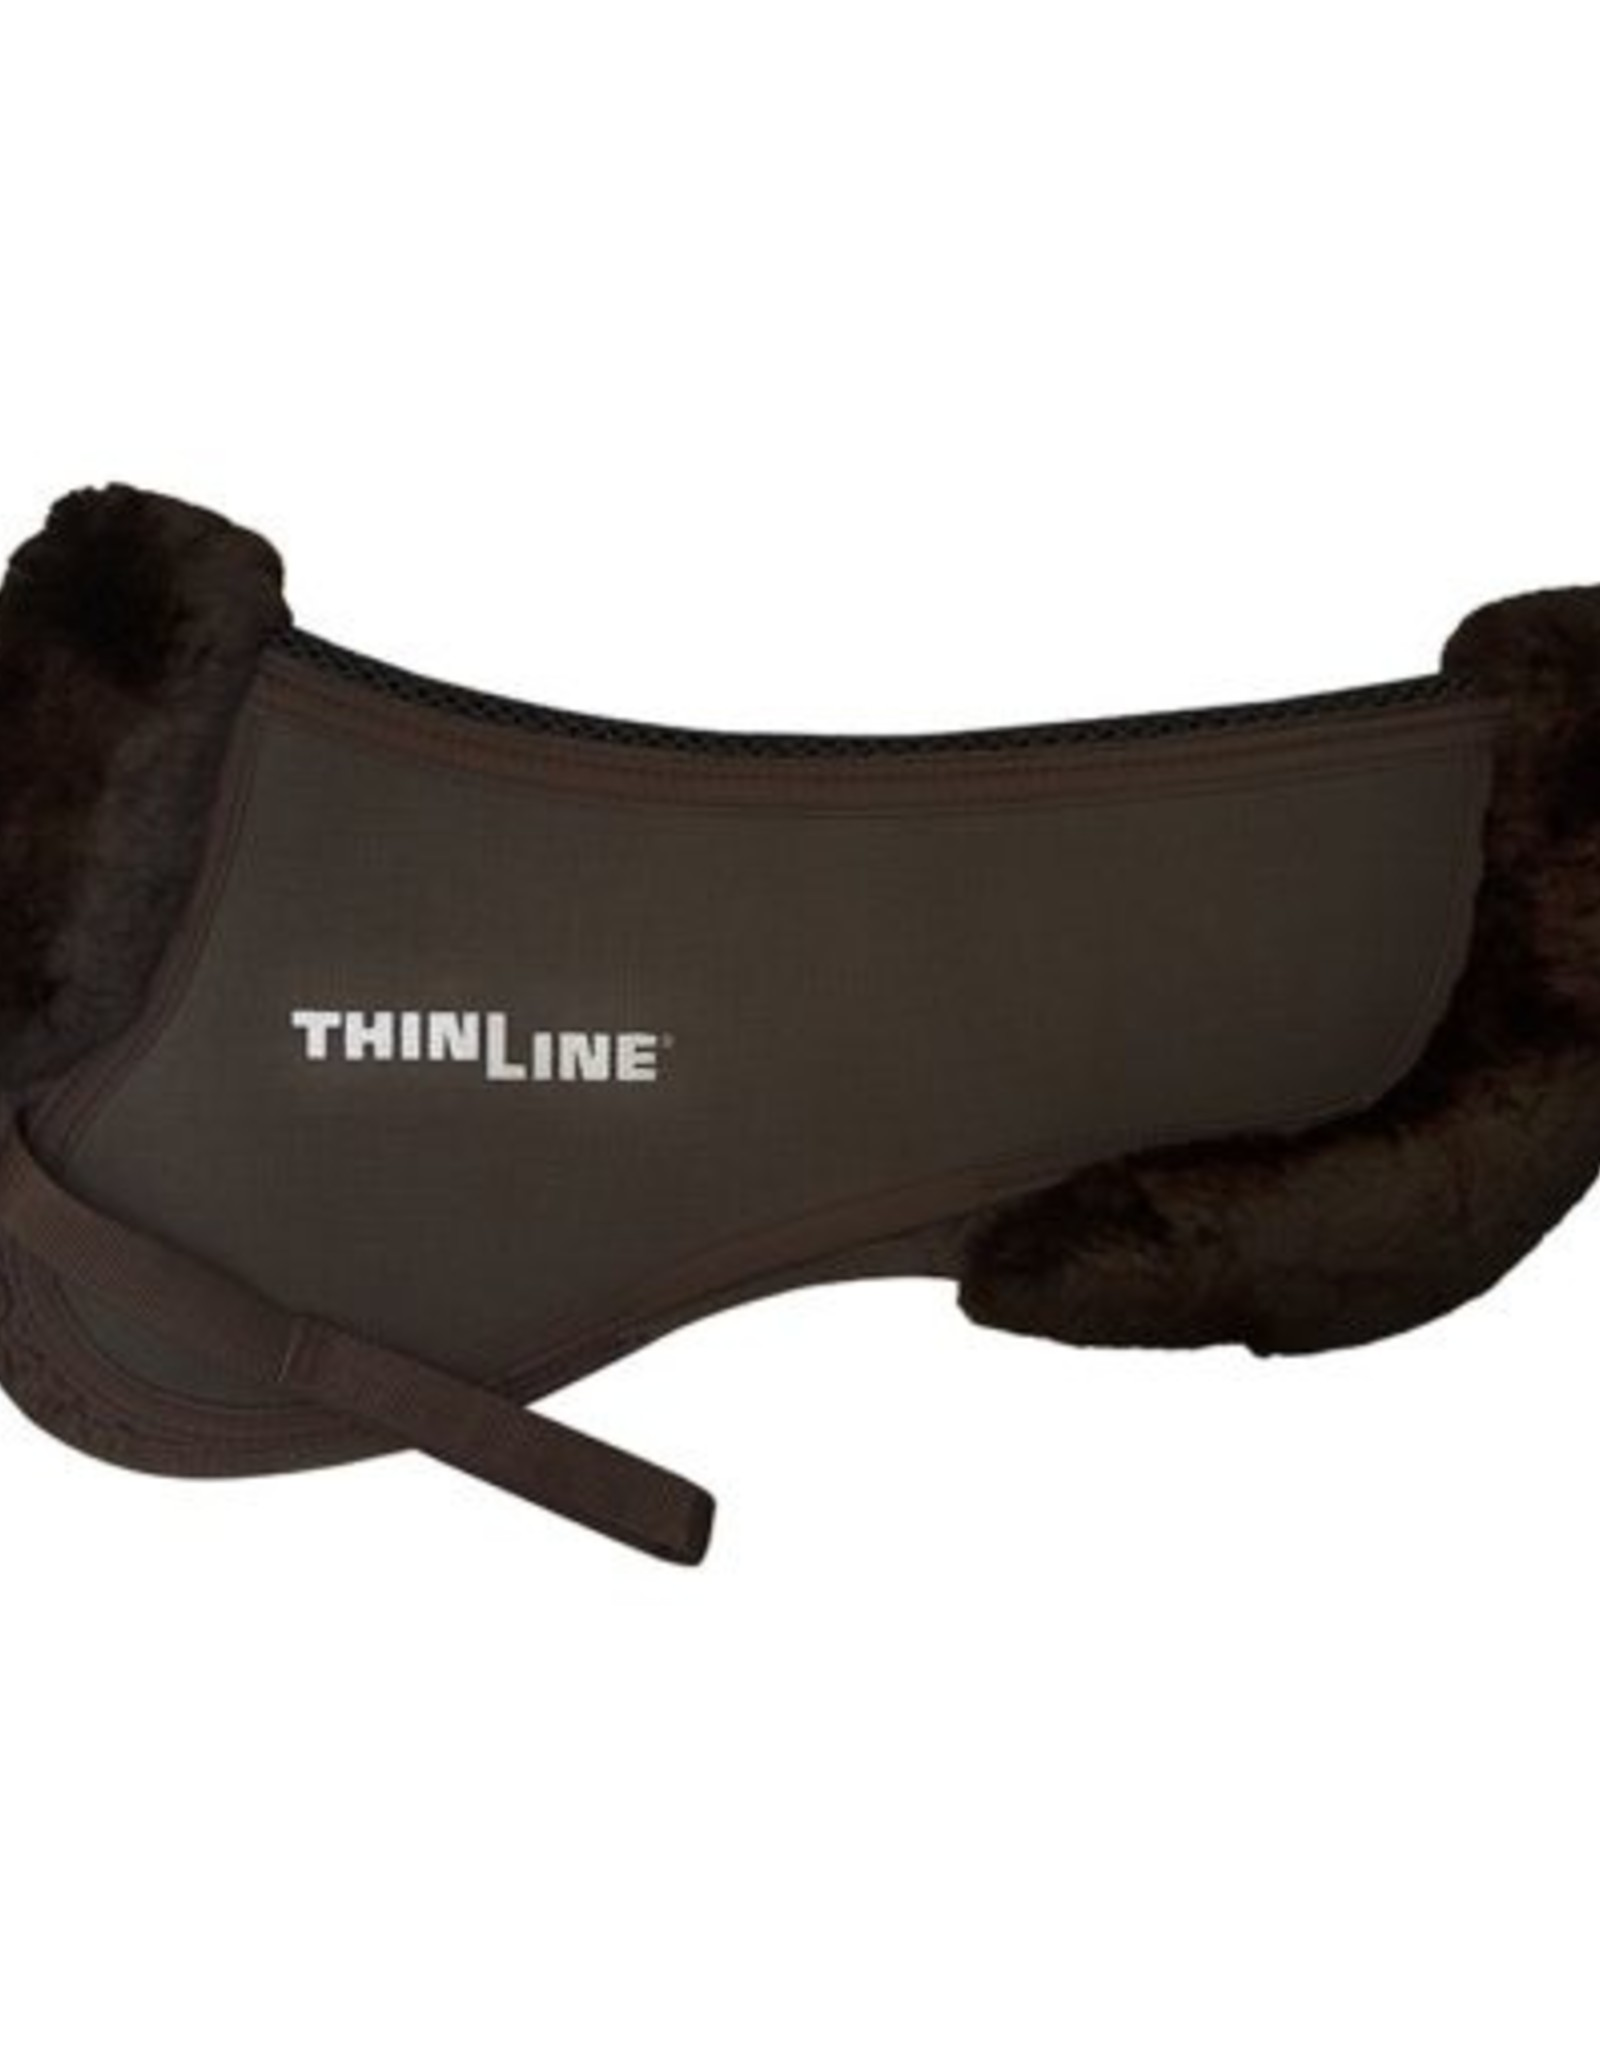 THINLINE NEW TRIFECTA COTTON HALF PAD WITH SHEEPSKIN ROLLS